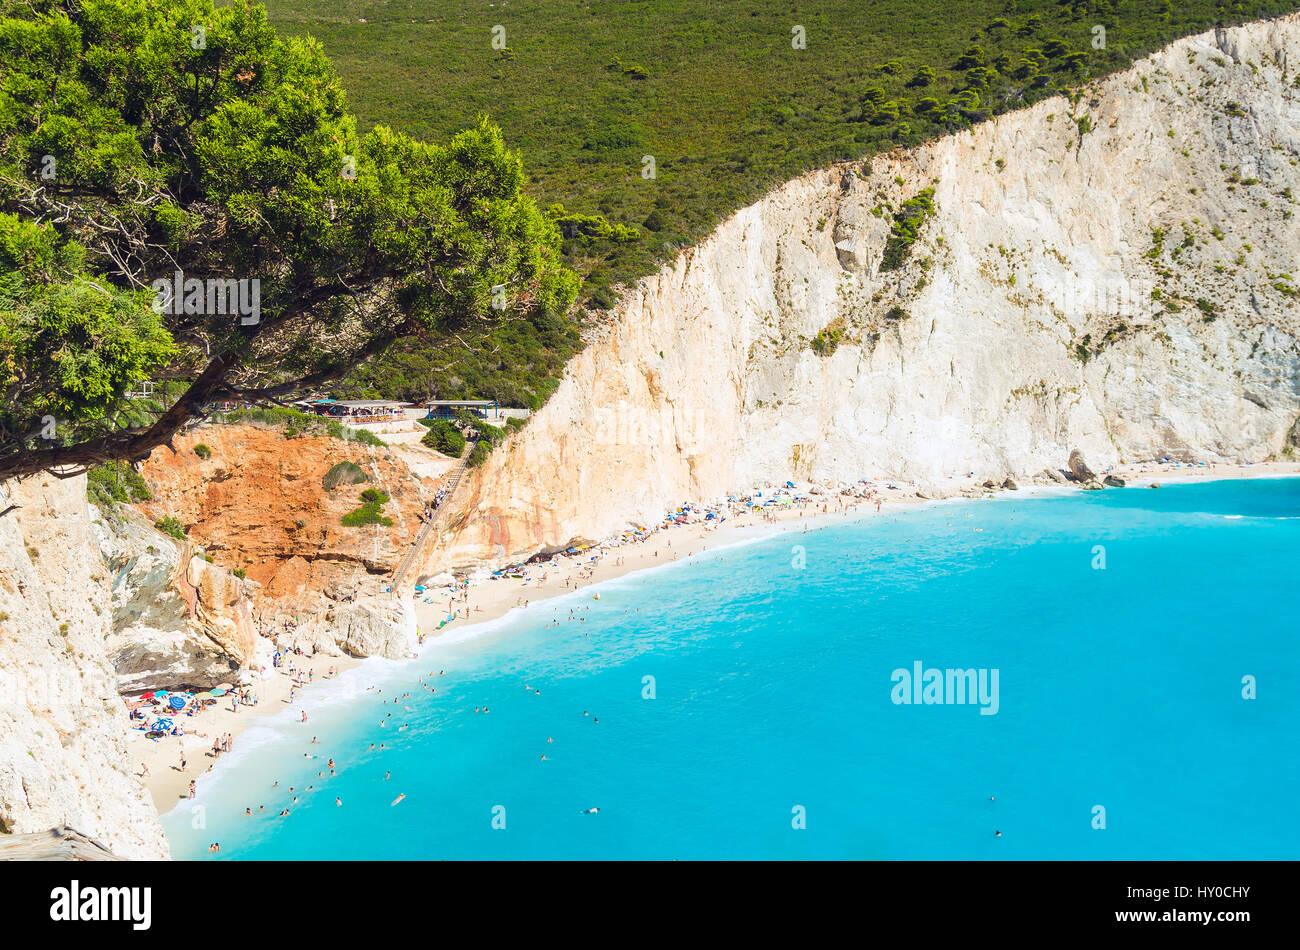 Porto Katsiki Lefkada beach tight shot from above - Stock Image